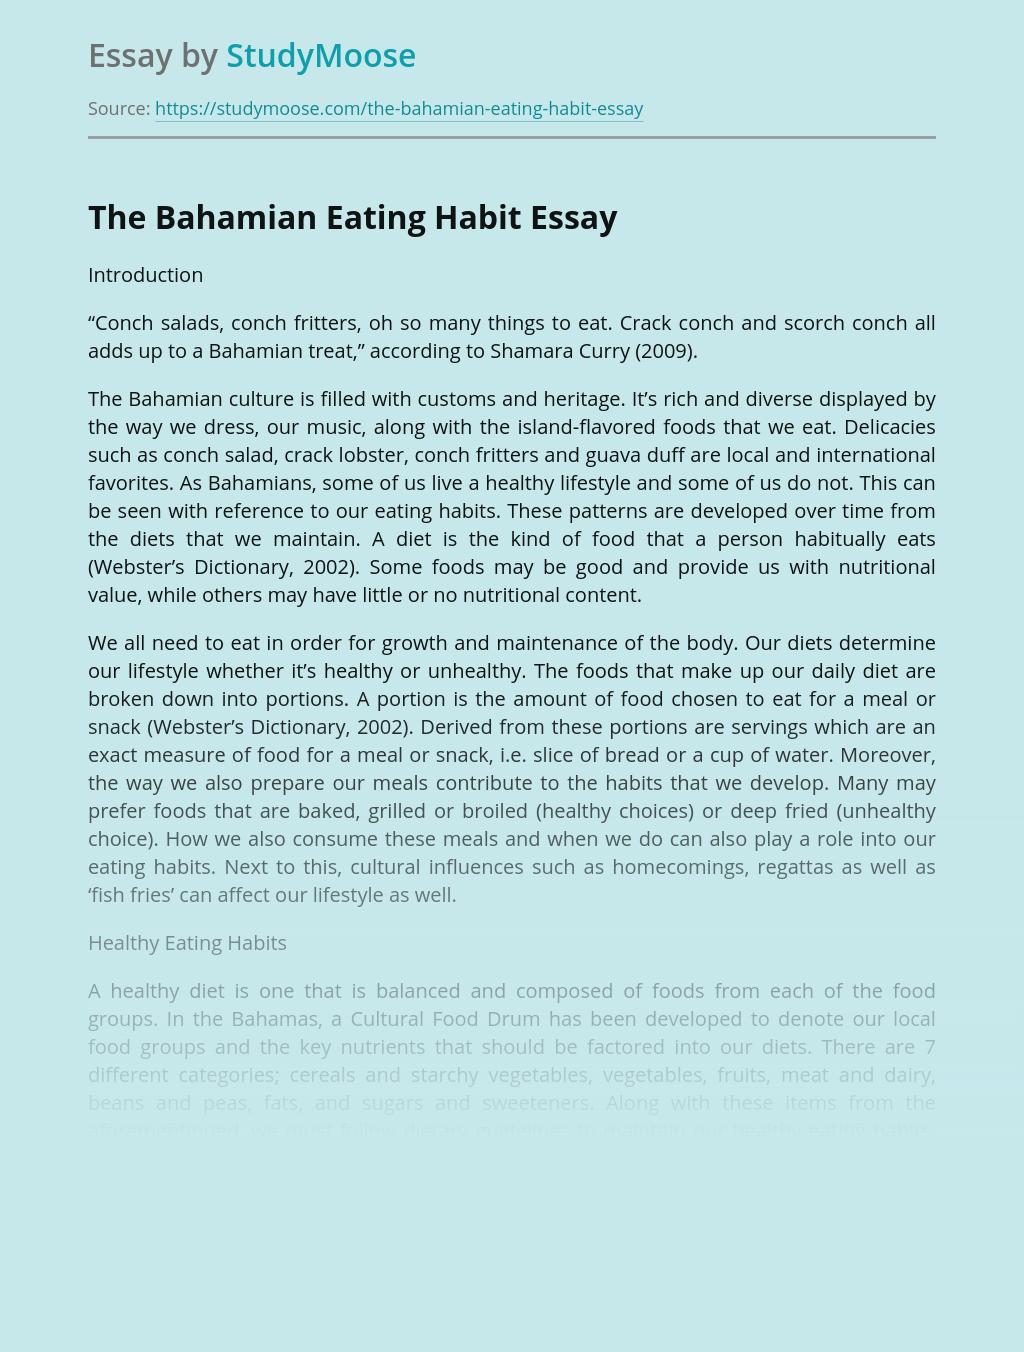 The Bahamian Eating Habit